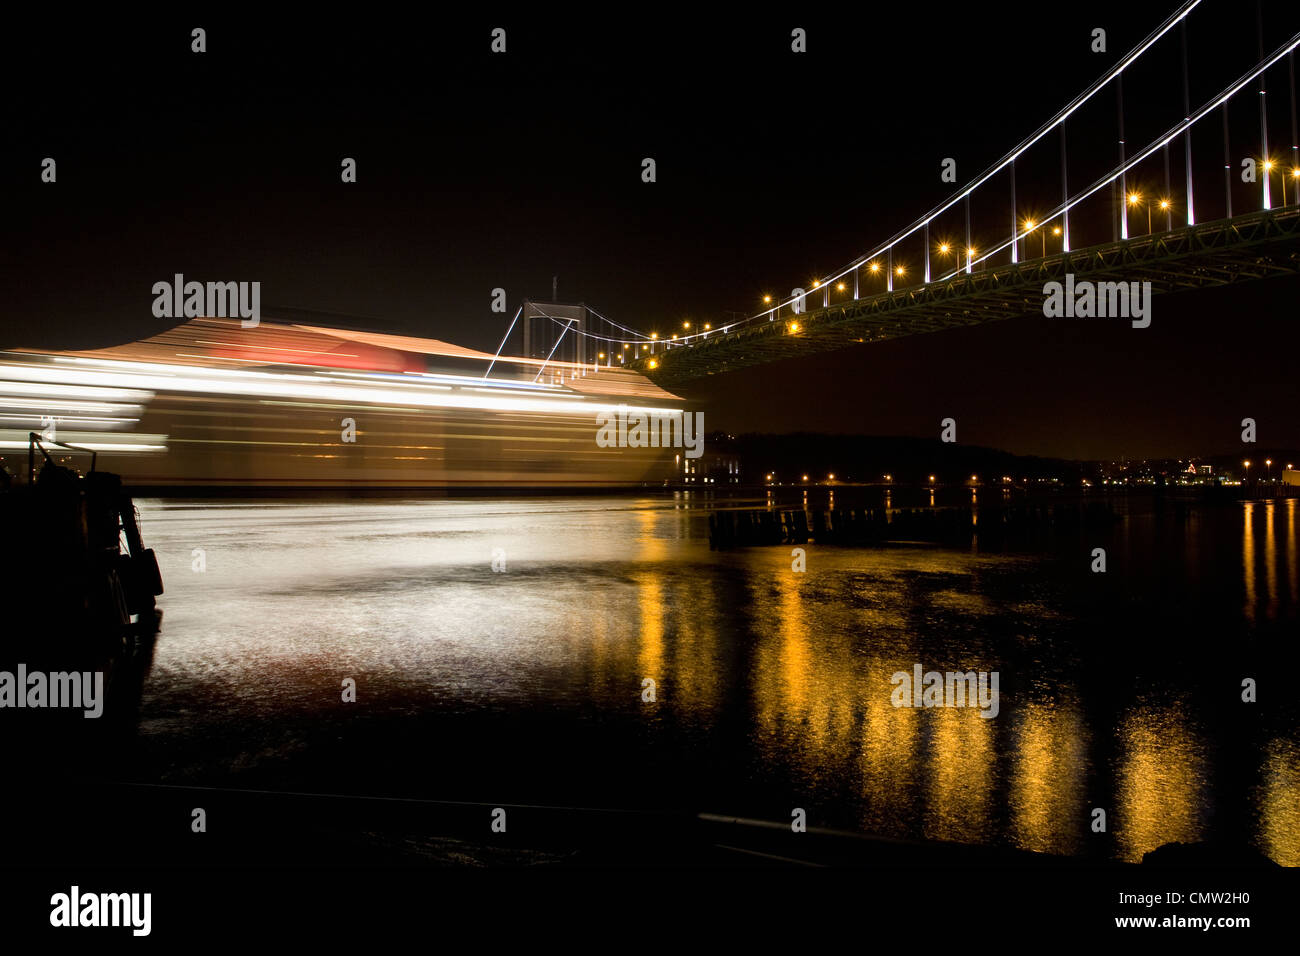 Beleuchtete Brücke in Göteborg in der Nacht Stockbild